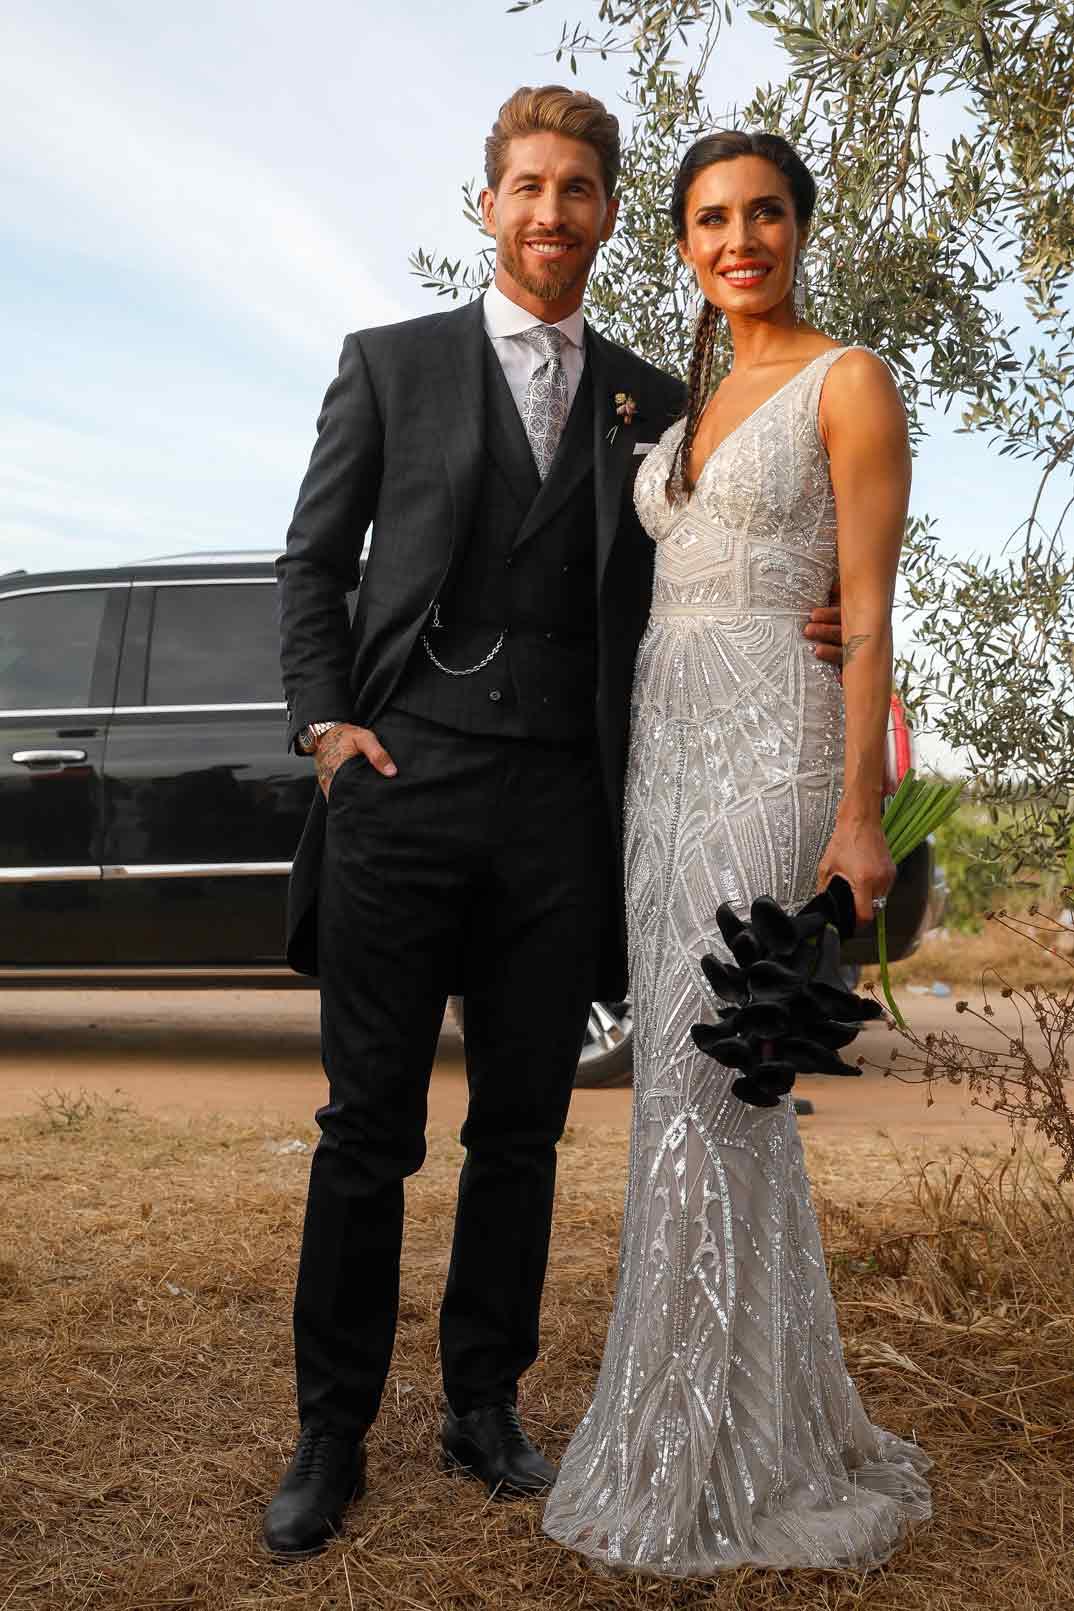 Pilar Rubio y Sergio Ramos boda